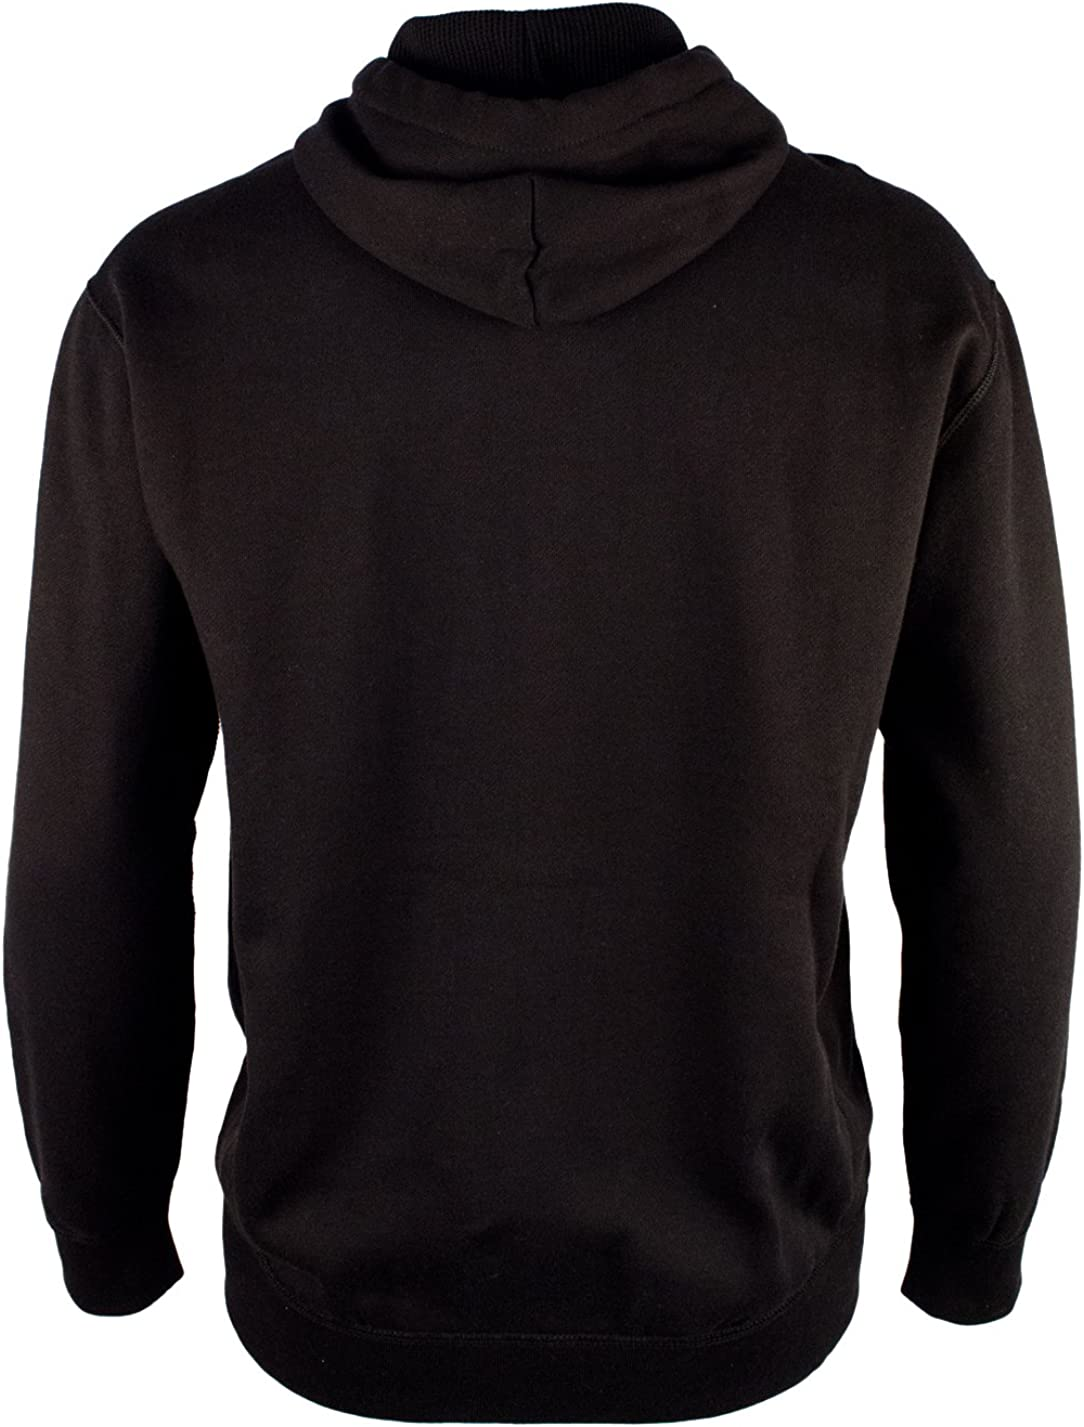 Polo Ralph Lauren Big & Tall Big & Tall Classic Fleece Full-Zip Hoodie